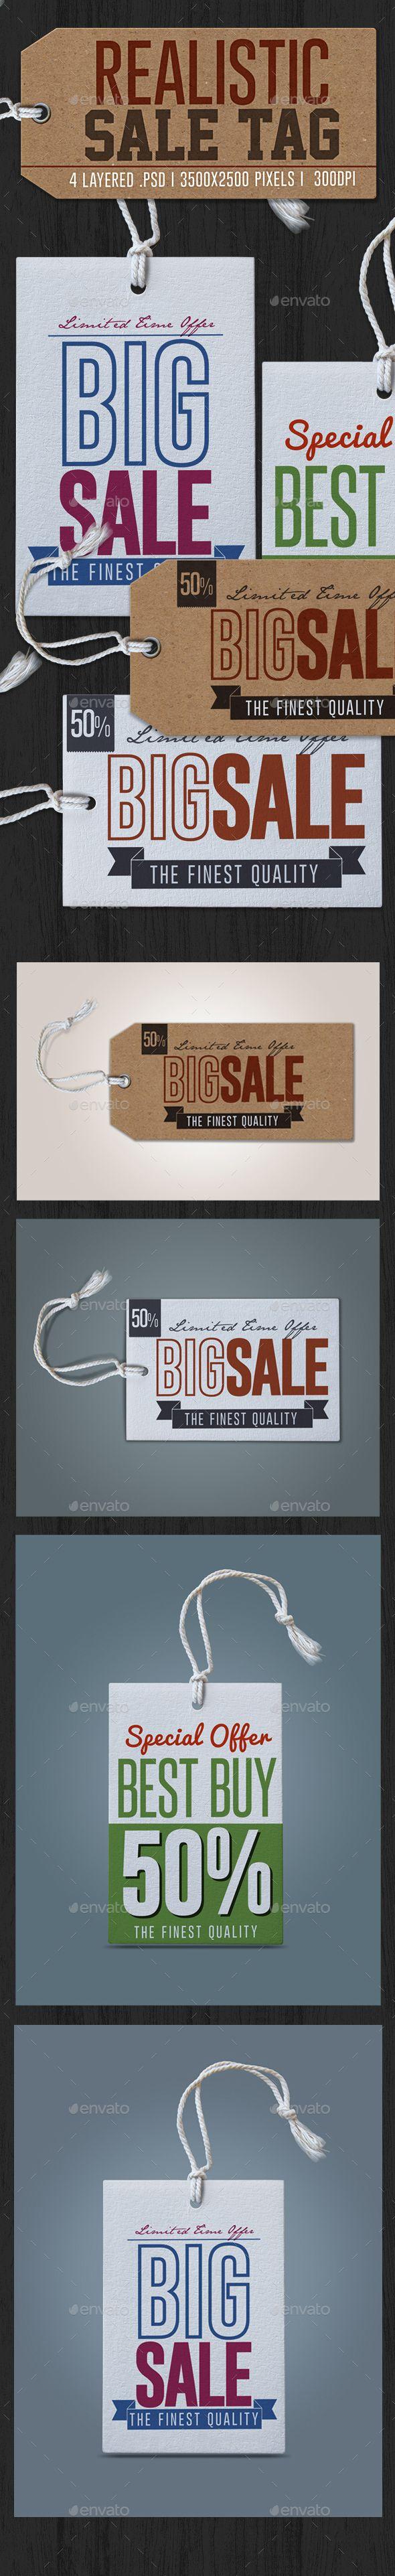 Realistic Sale Tag